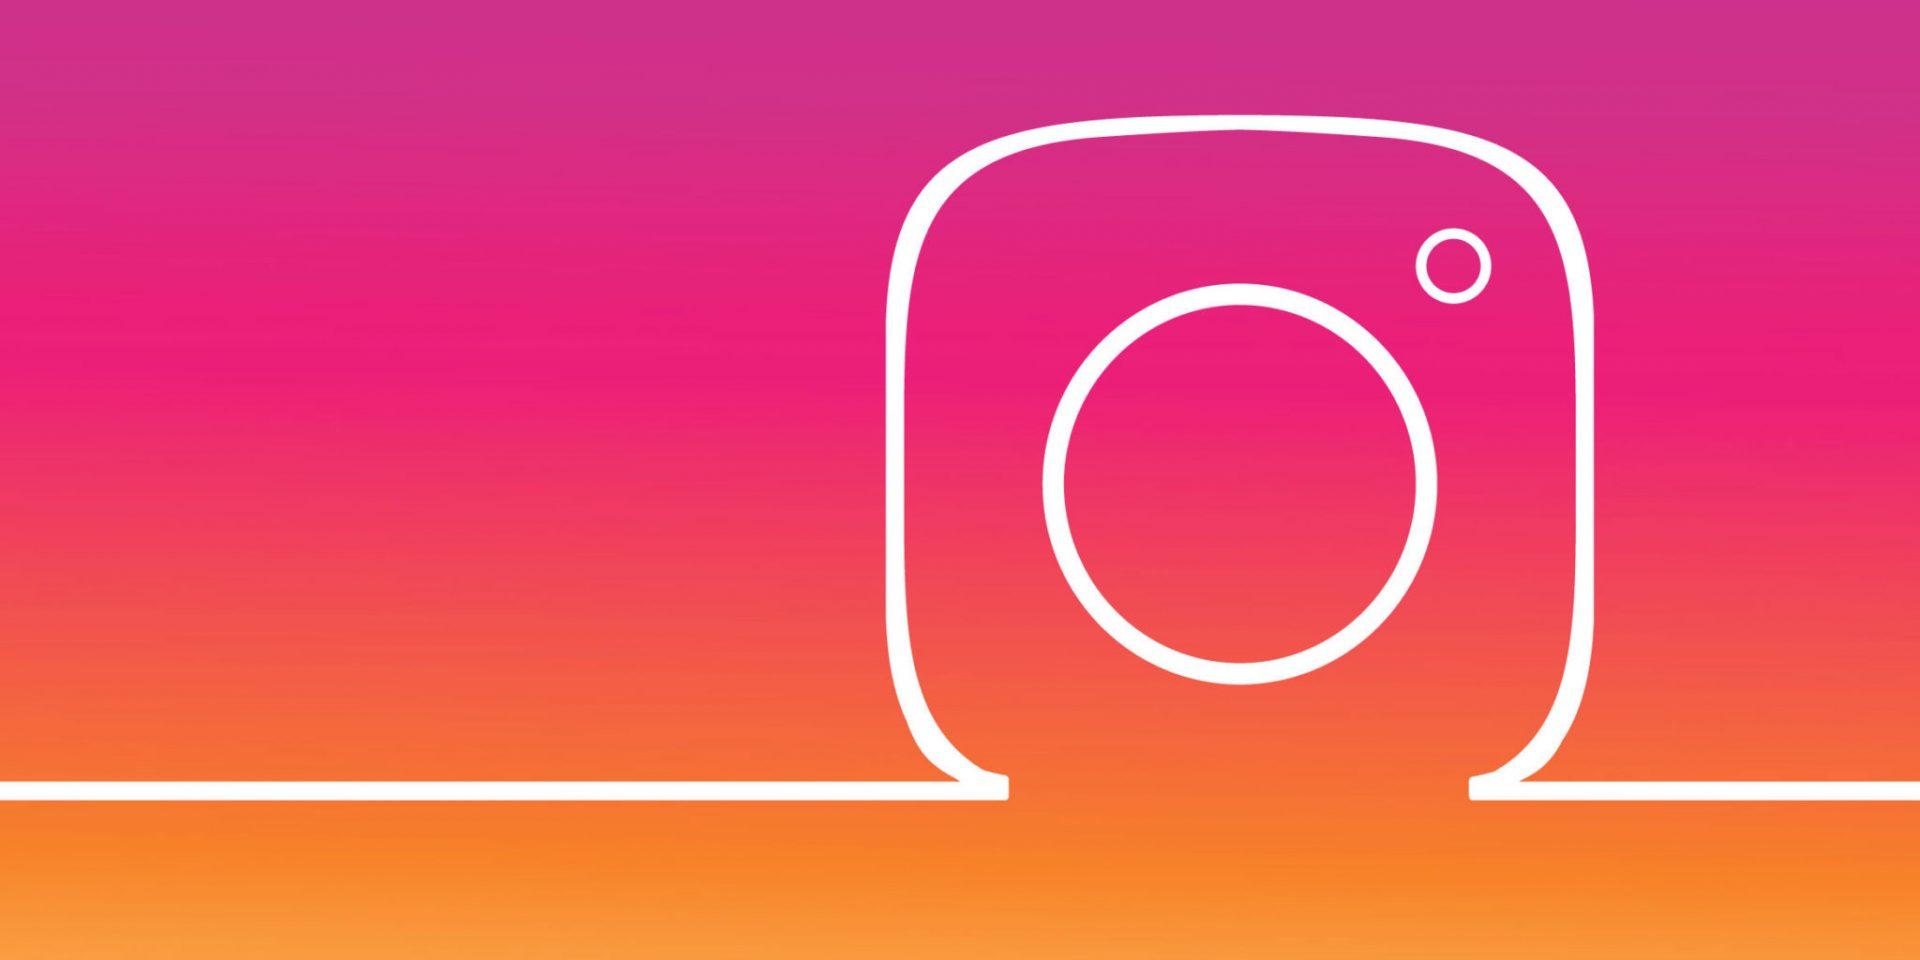 Instagram come aprire un account